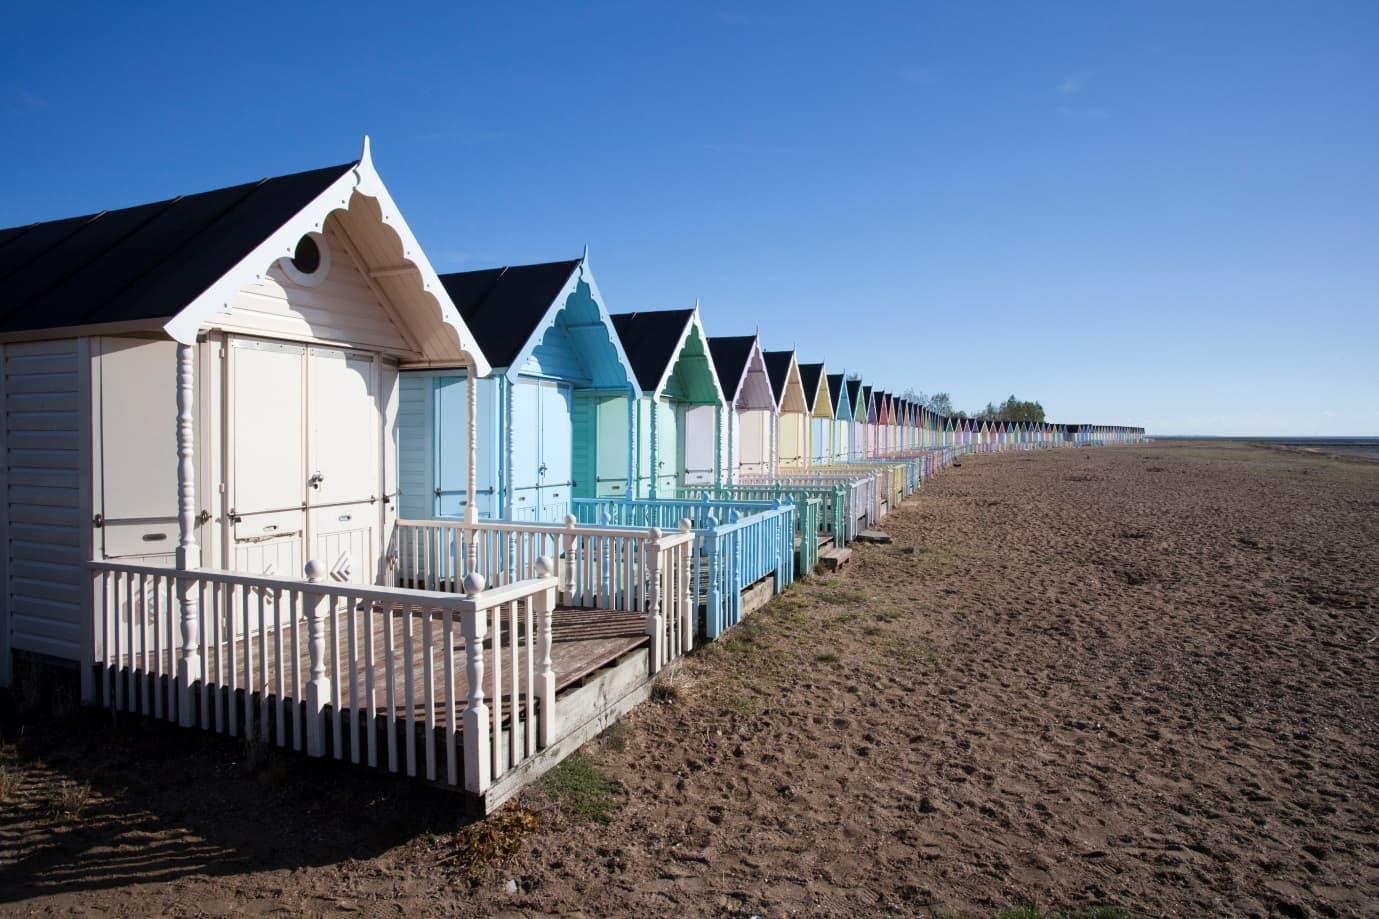 Picture of the Essex coastline.